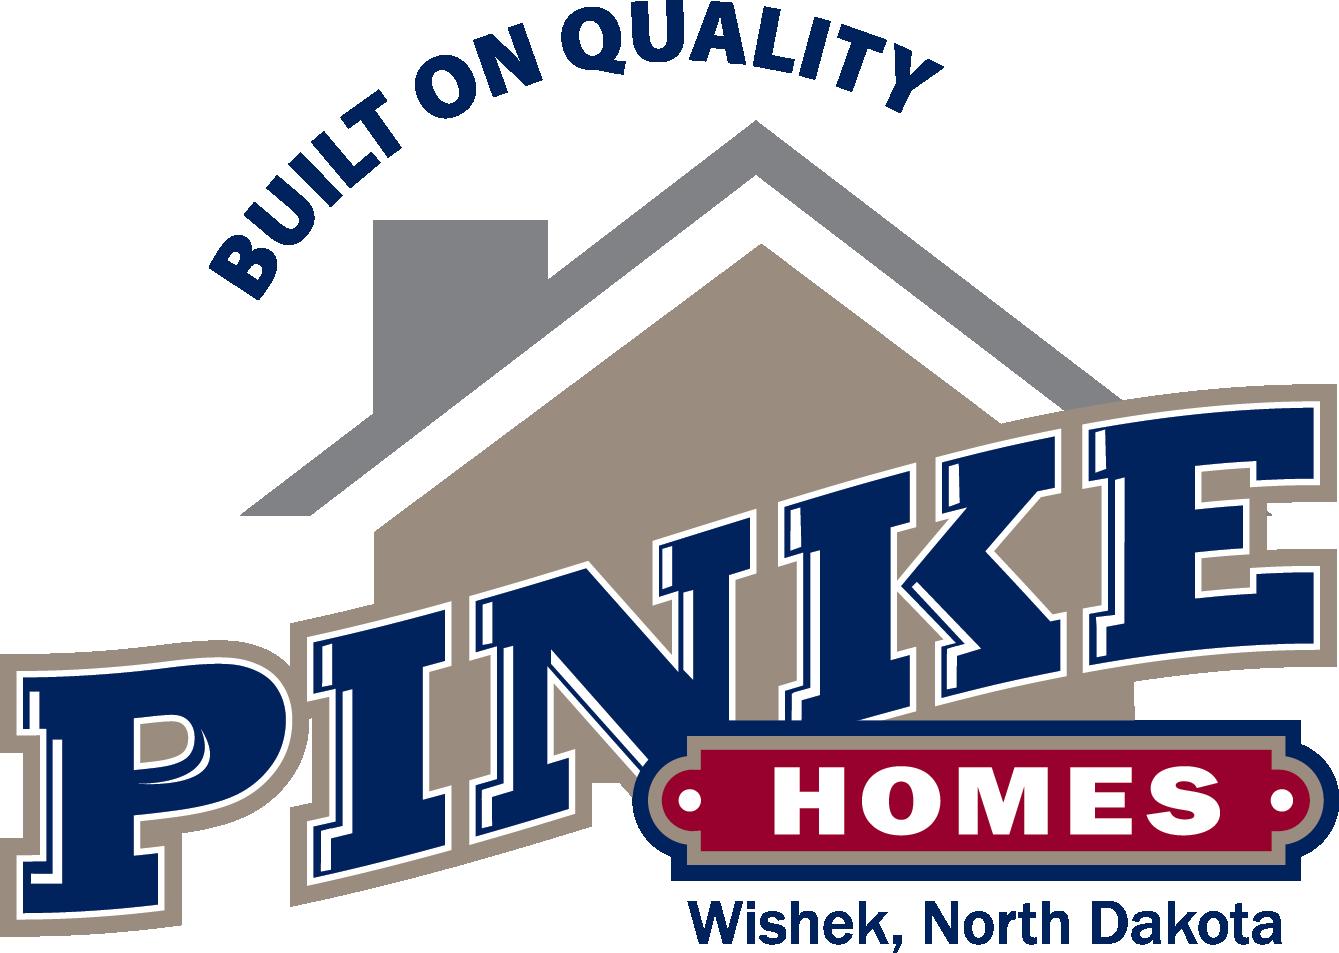 sc 1 st  Pinke Lumber & Cold Storage Buildings - Pinke